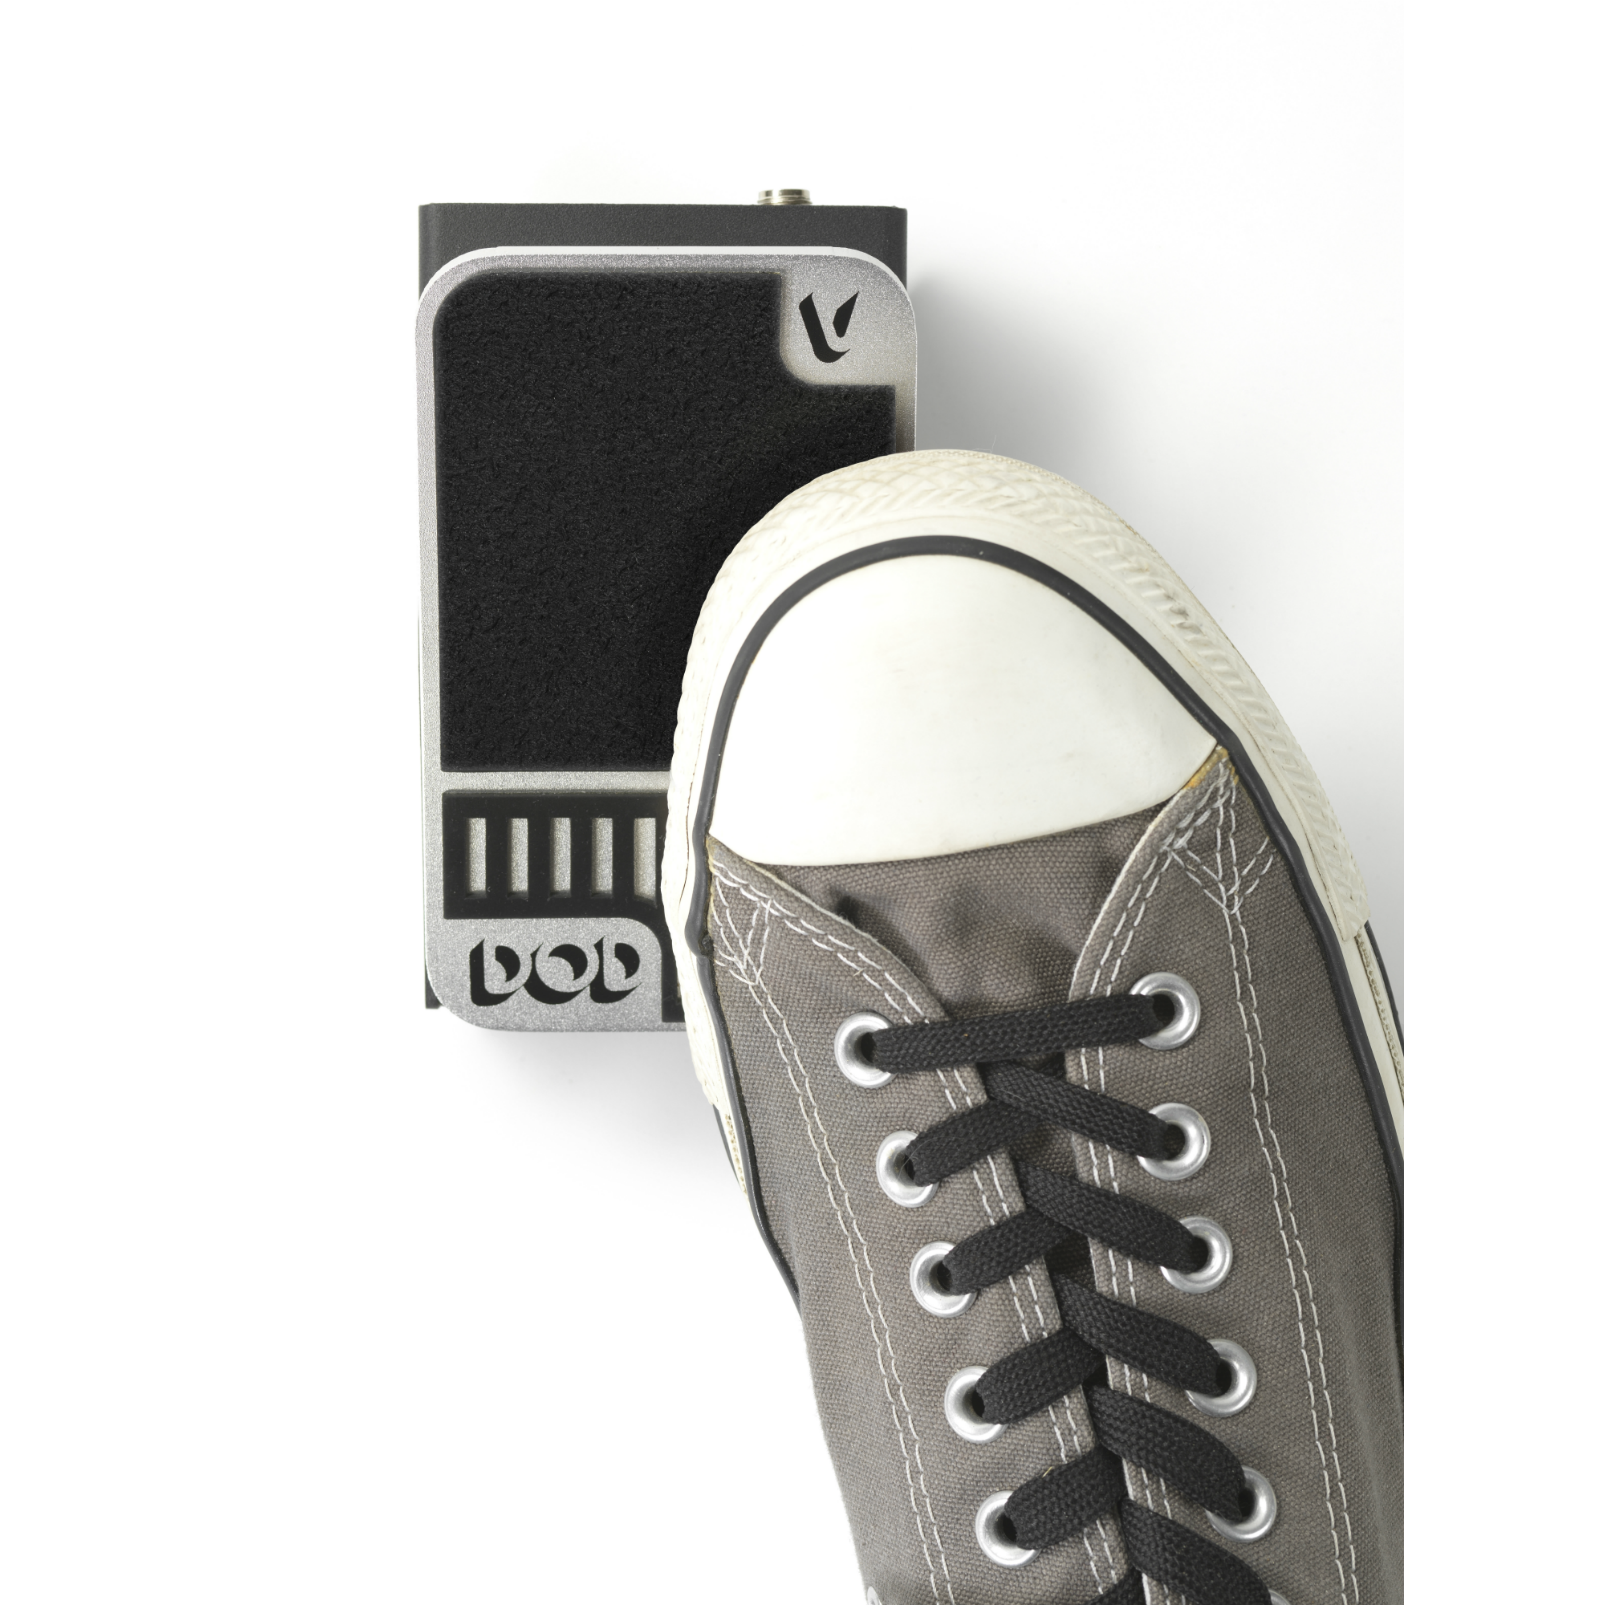 DOD Mini Volume - Black - Volume Pedal - Detailshot 1